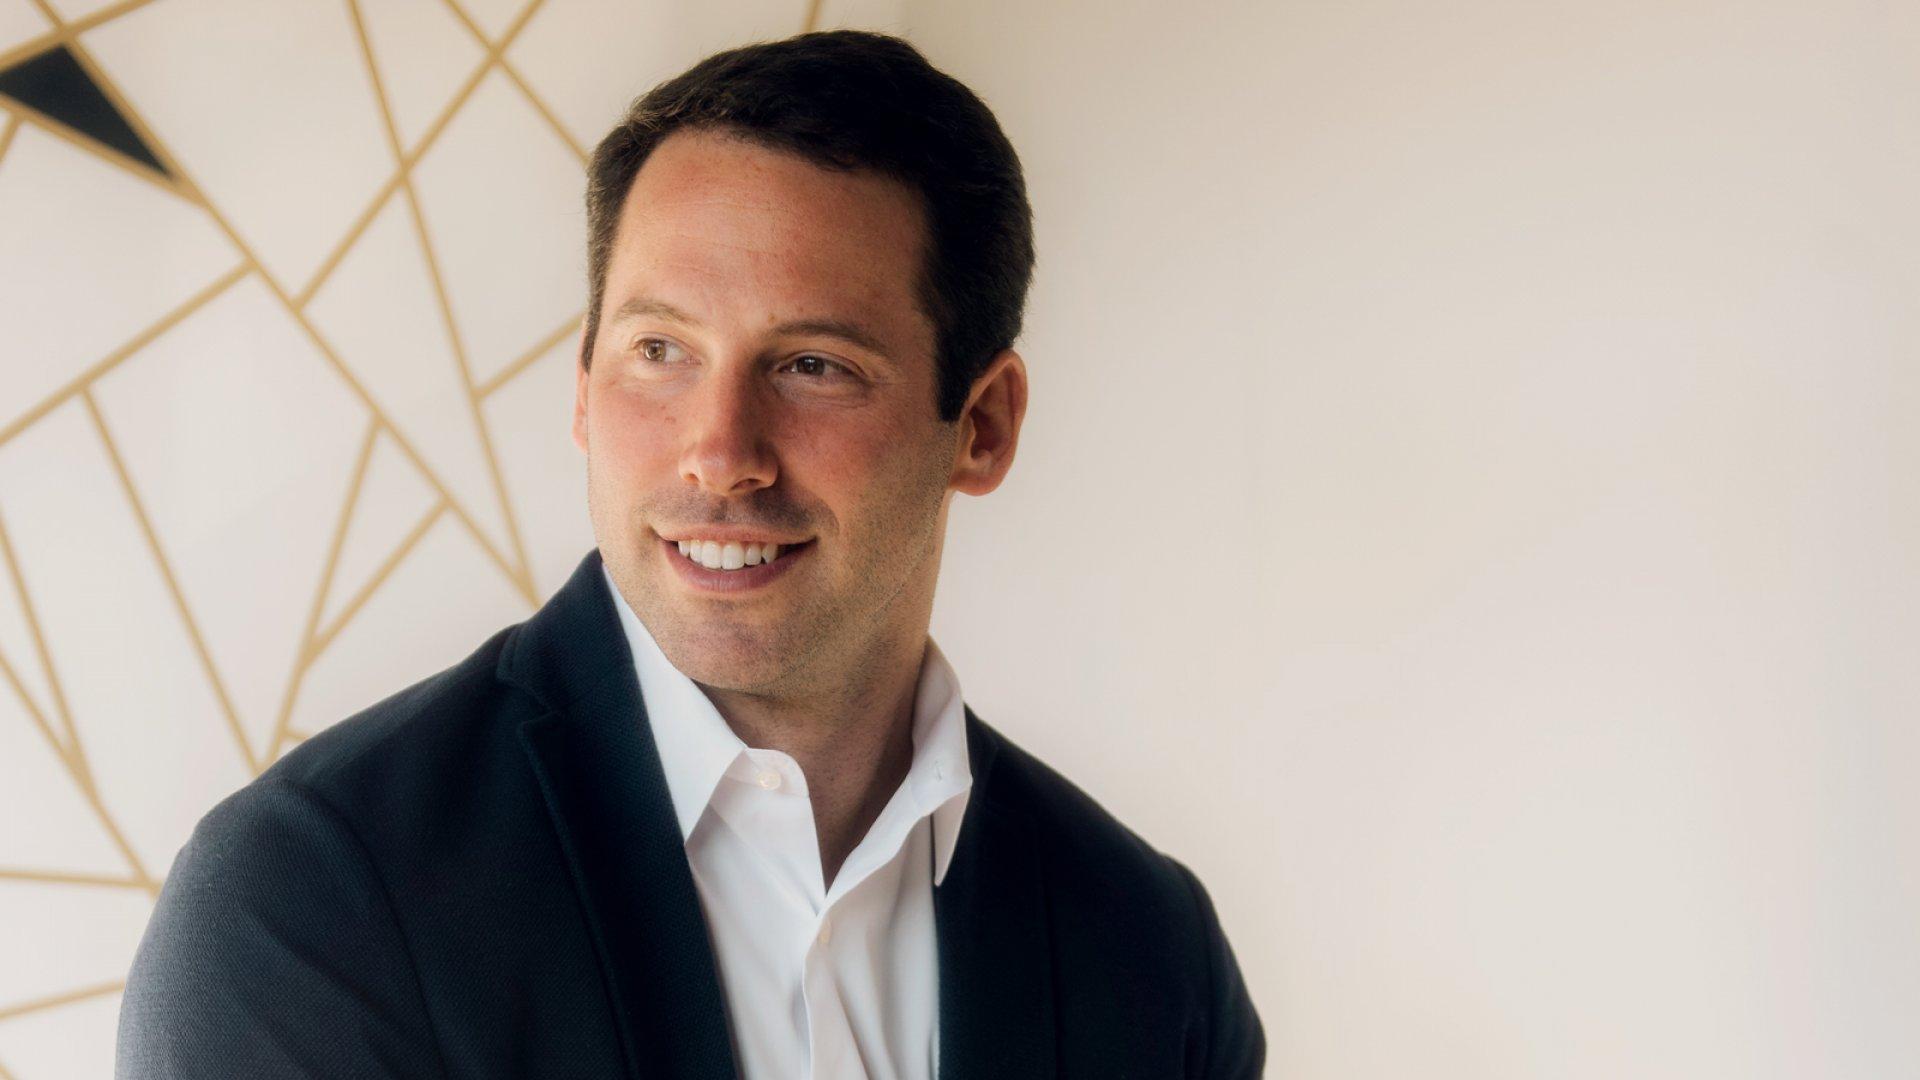 Brandon Chasen, CEO of Chasen Construction.